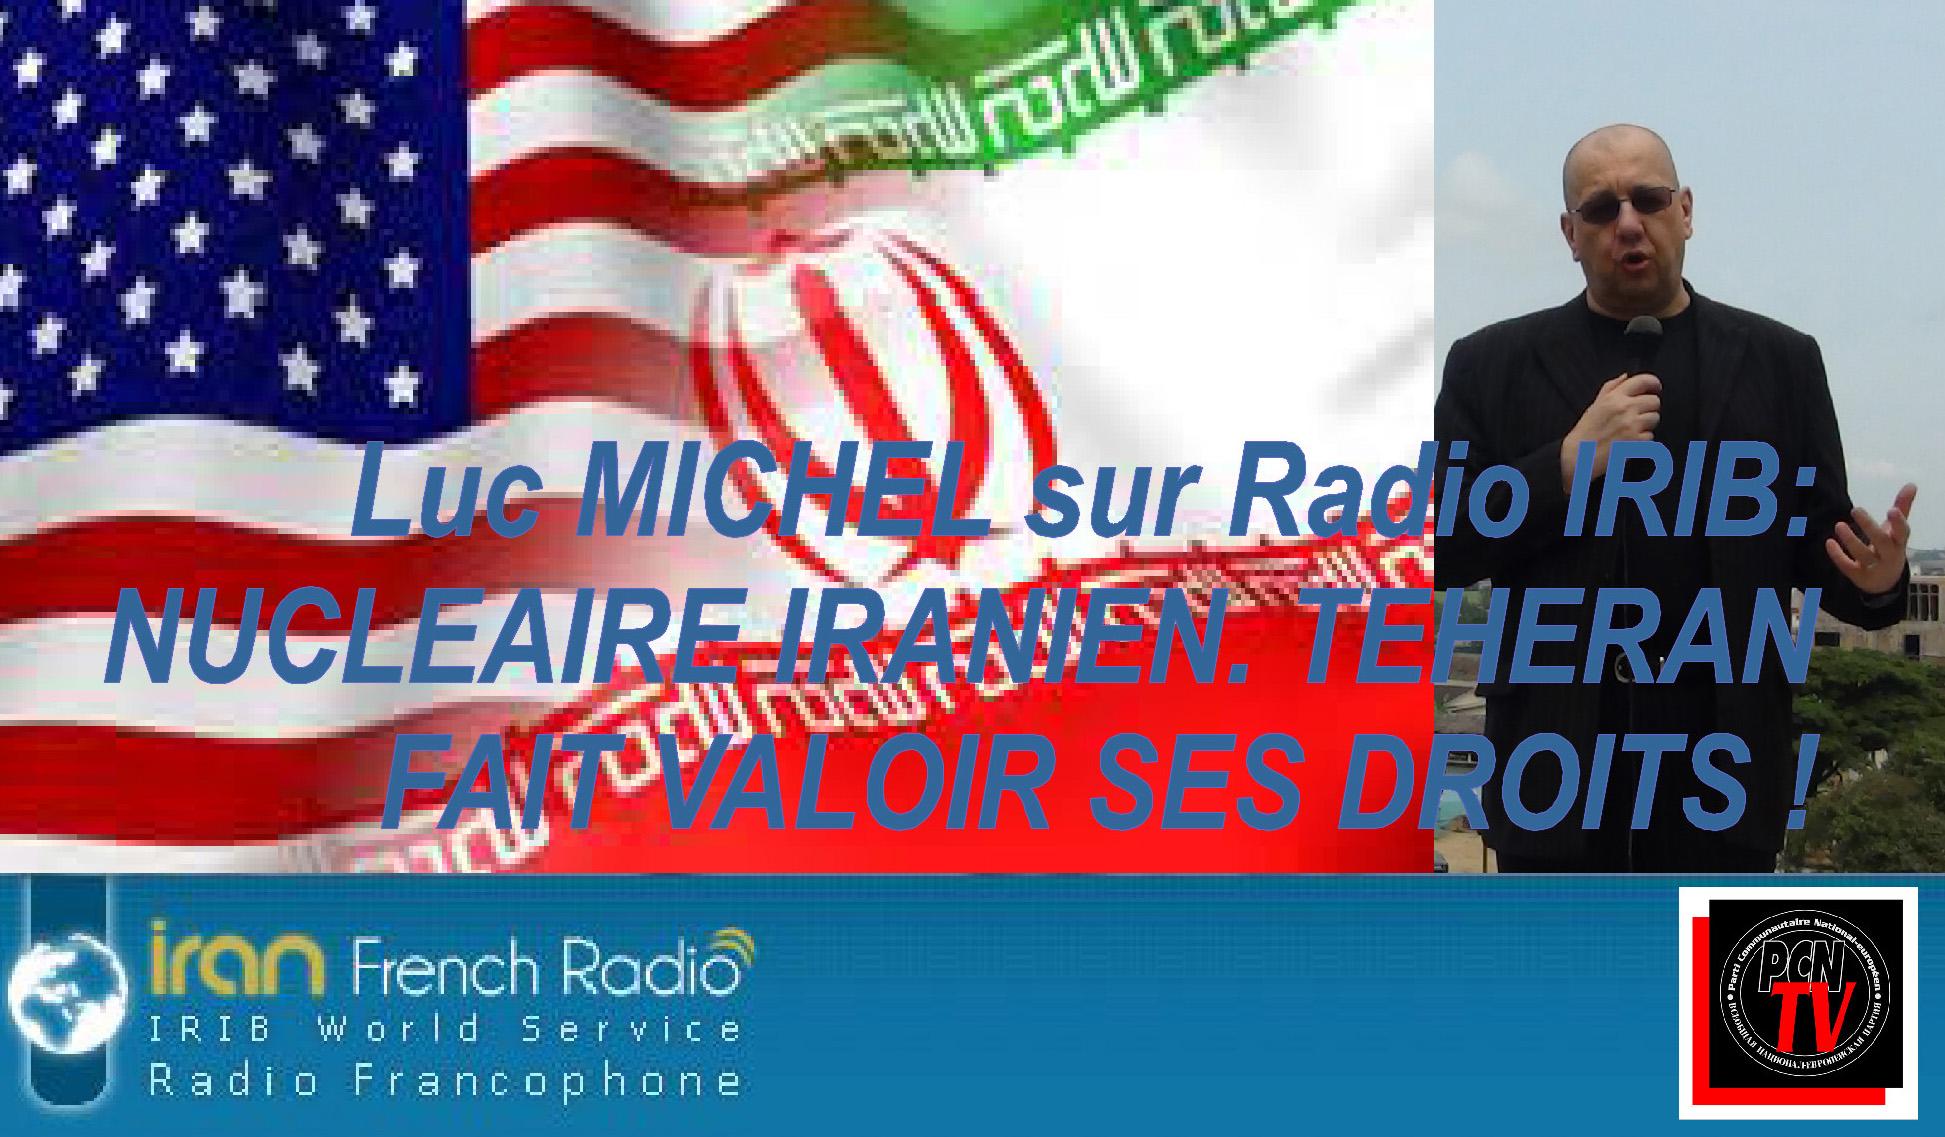 PCN-TV - LM sur IRIB nucleaire iranien (2015 02 13) FR